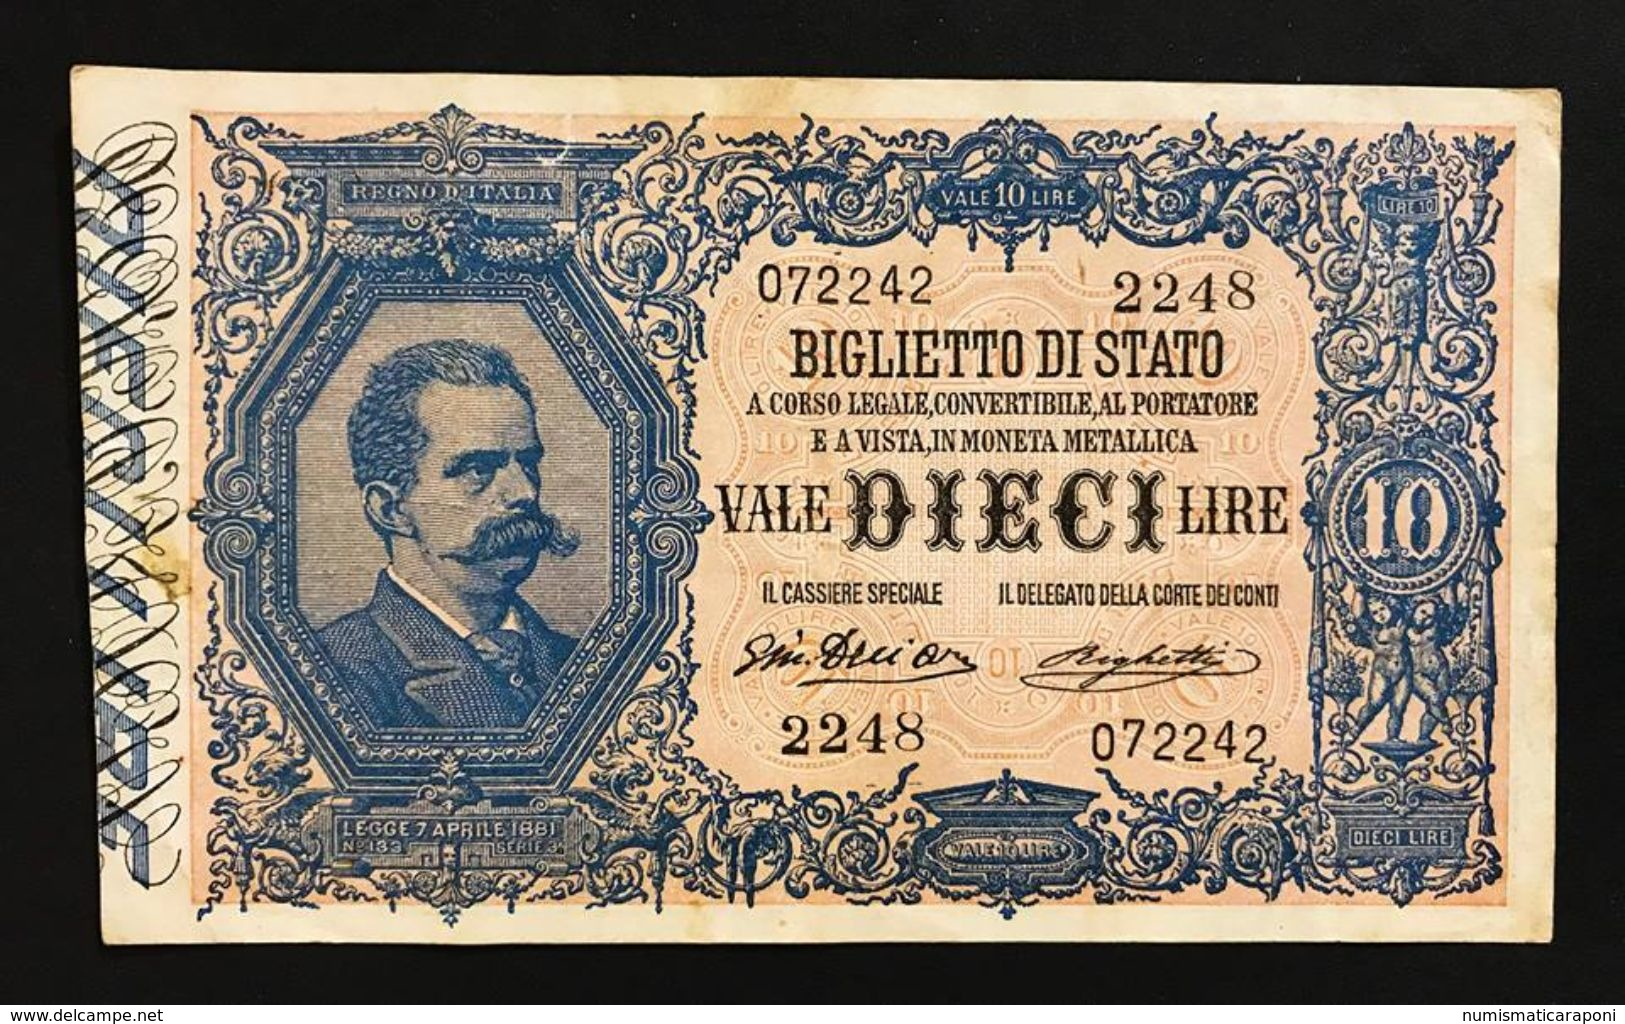 10 Lire Vittorio Emanuele III° Serie 2248 11 10 1915 Raro Naturale Bb/spl LOTTO 379 - Italia – 10 Lire